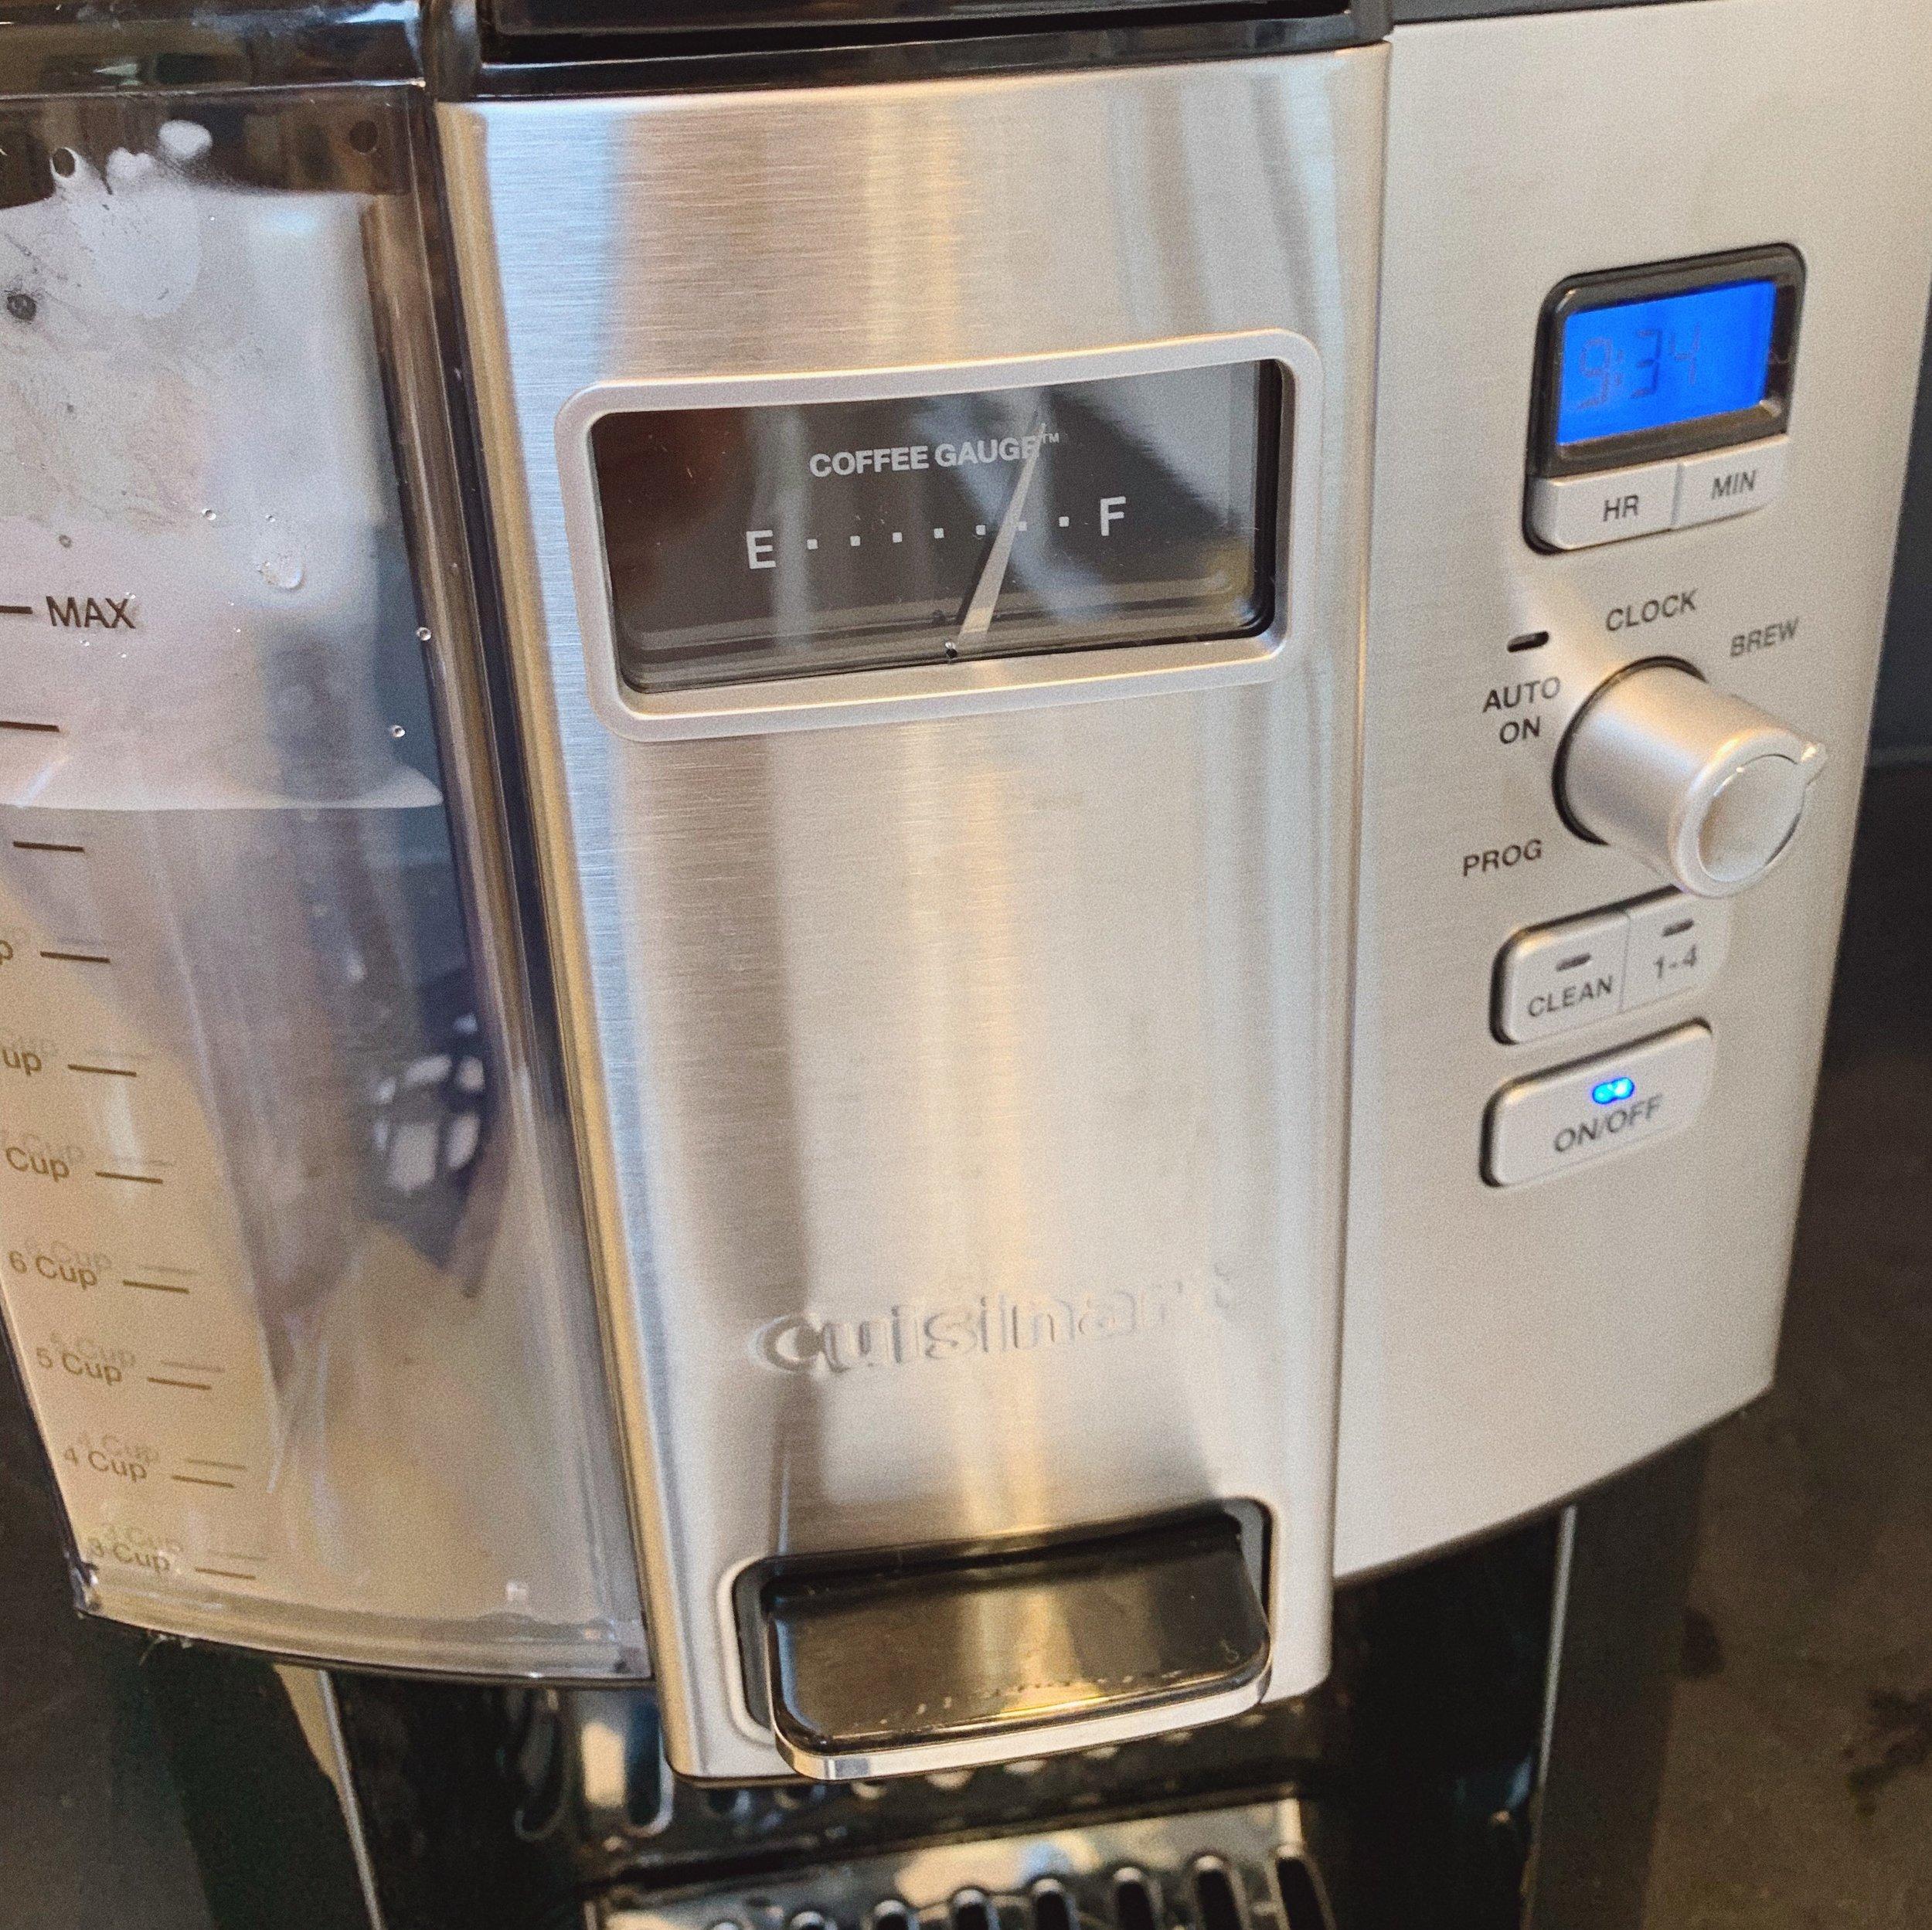 The Coffee Gauge™